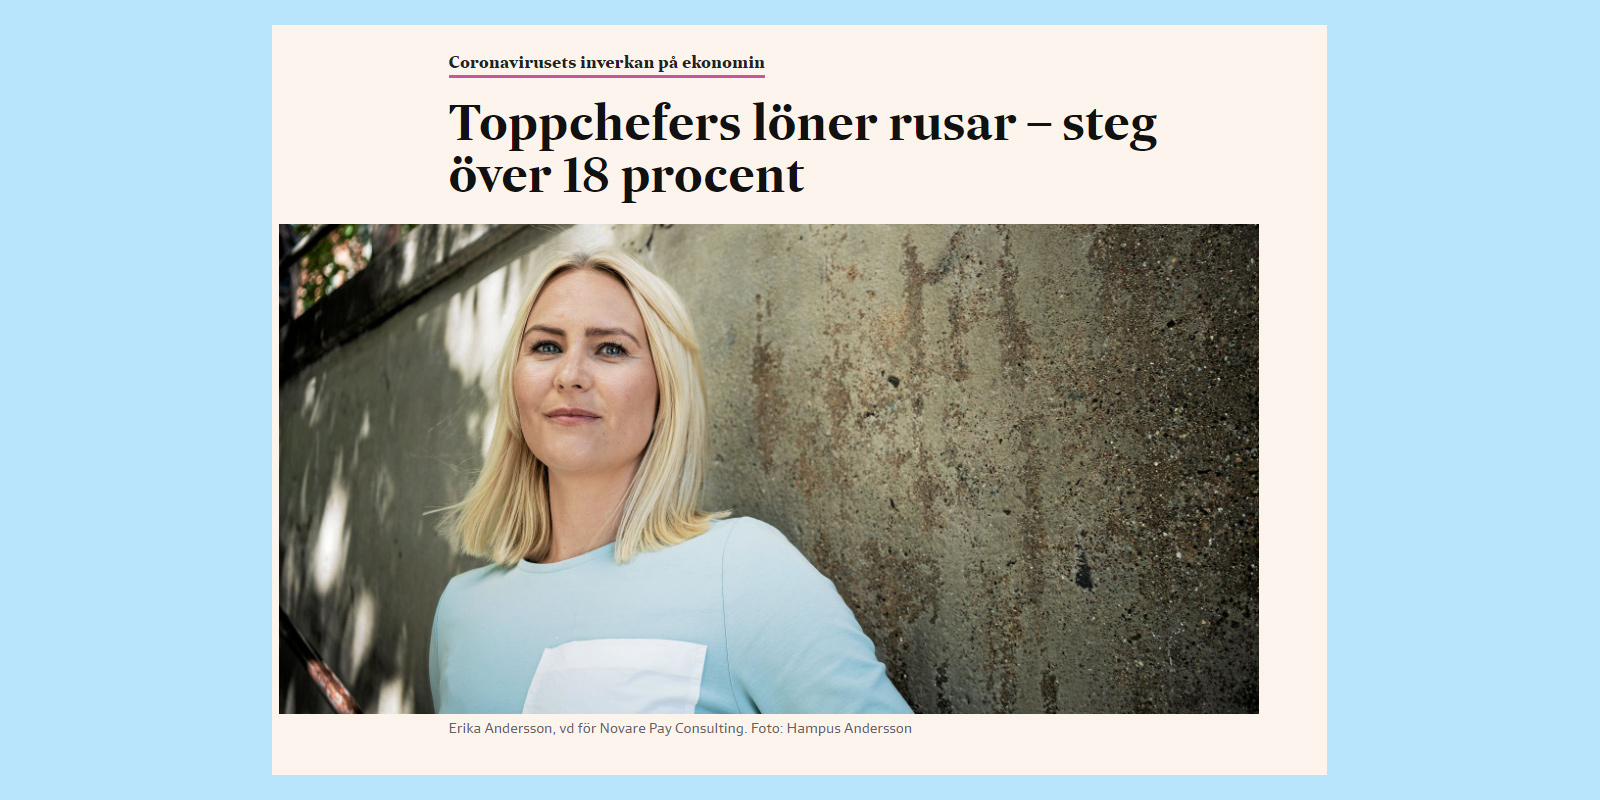 Erika Andersson intervjuad i SvD